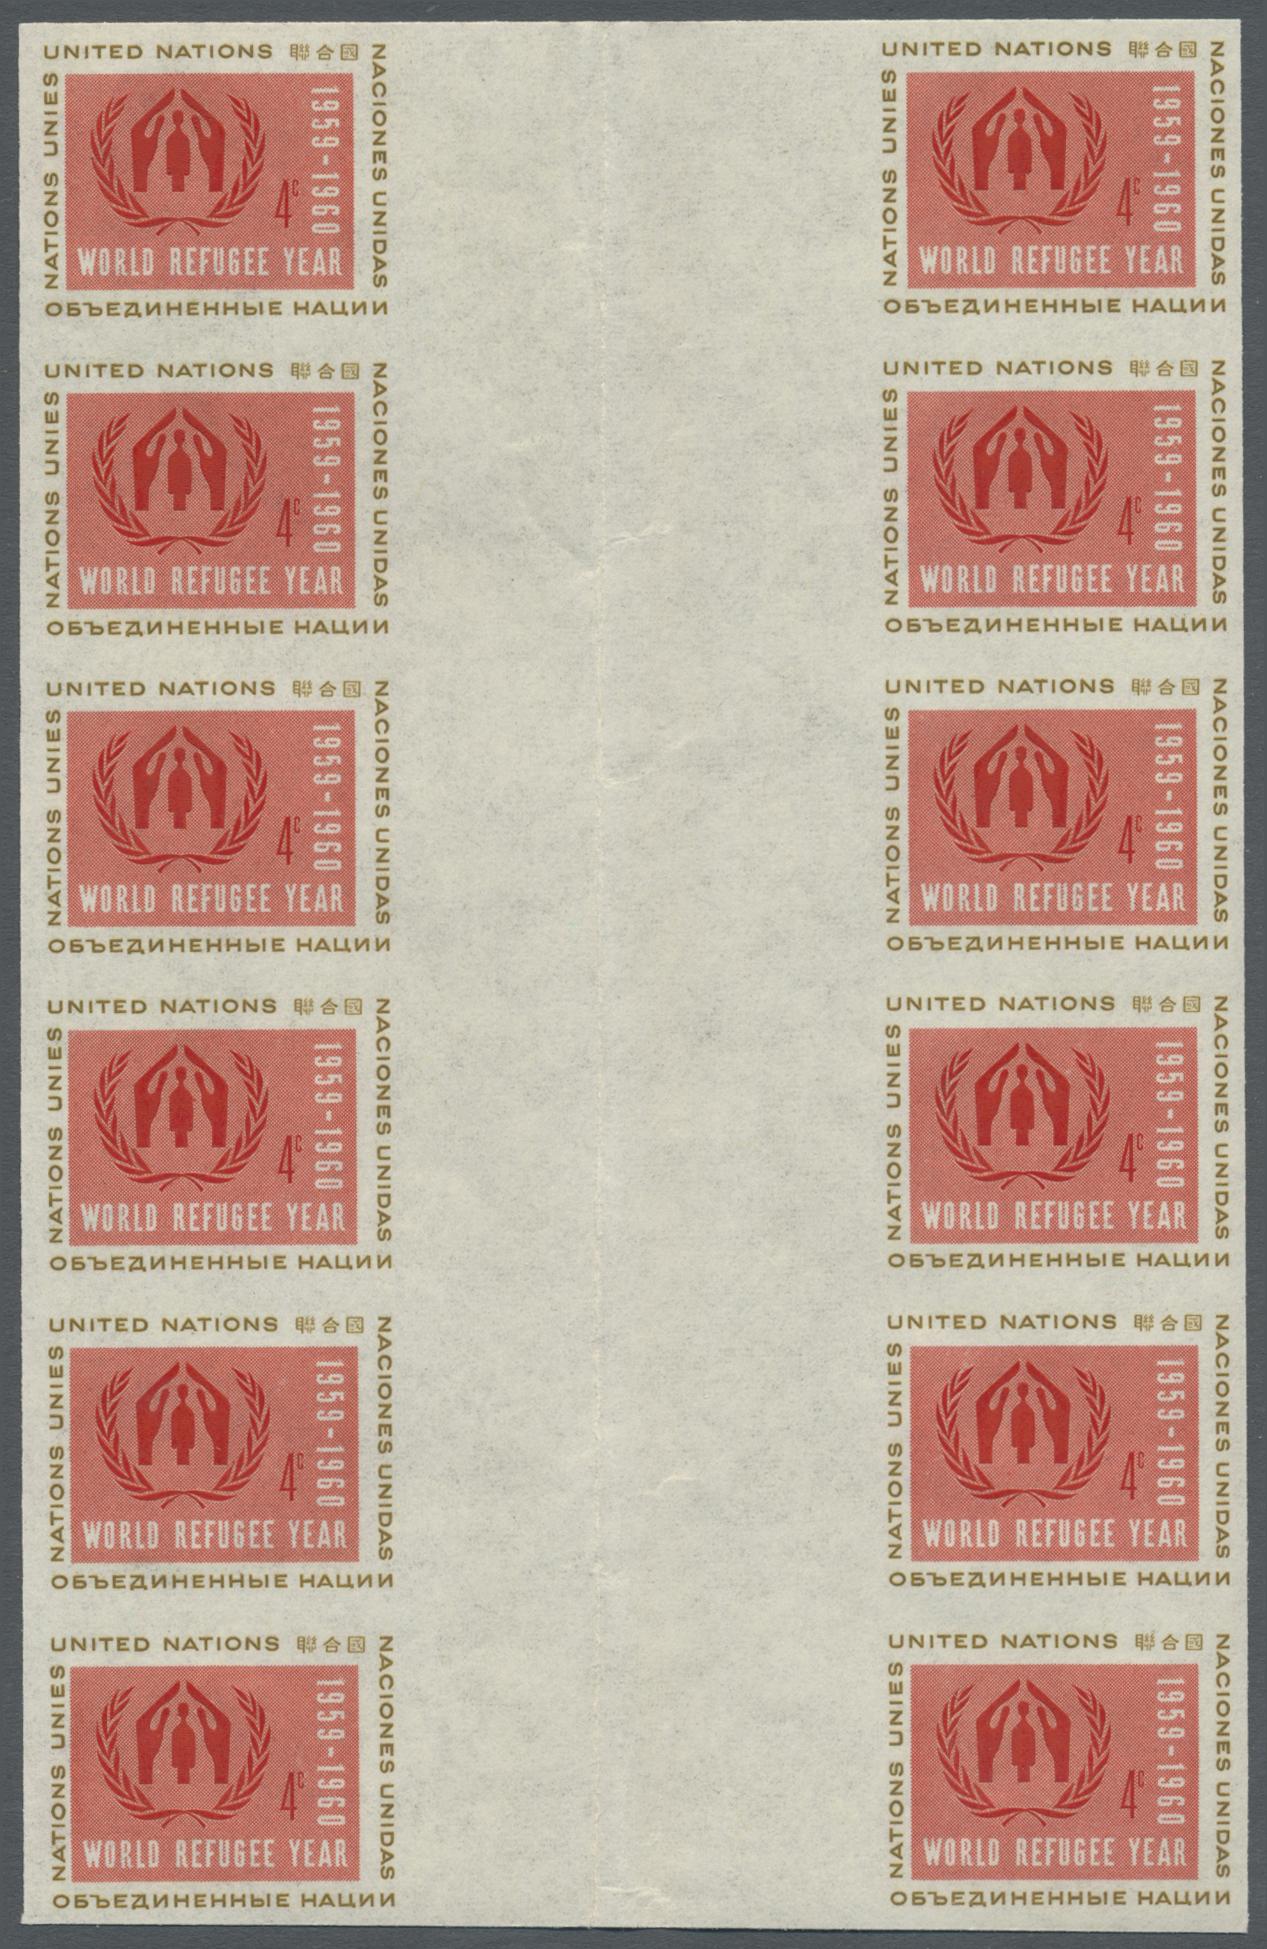 Lot 14795 - Vereinte Nationen - New York  -  Auktionshaus Christoph Gärtner GmbH & Co. KG Single lots Philately Overseas & Europe. Auction #39 Day 4